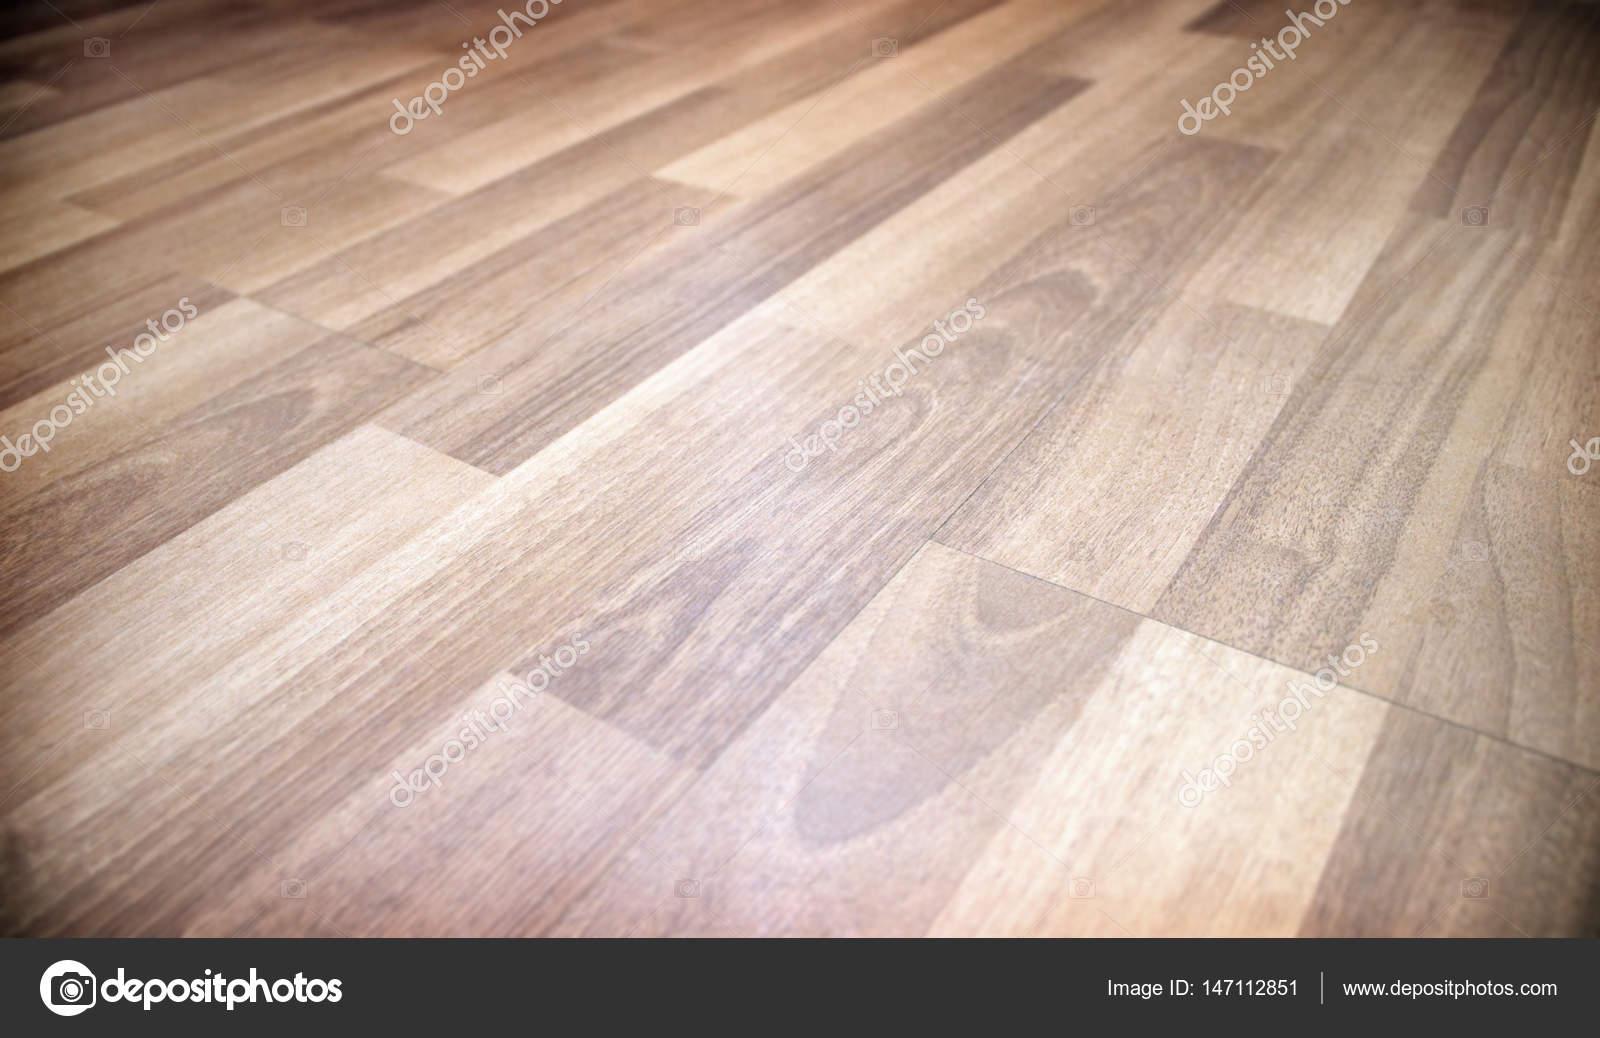 Sfondo di texture di parquet u2014 foto stock © bgodunoff #147112851